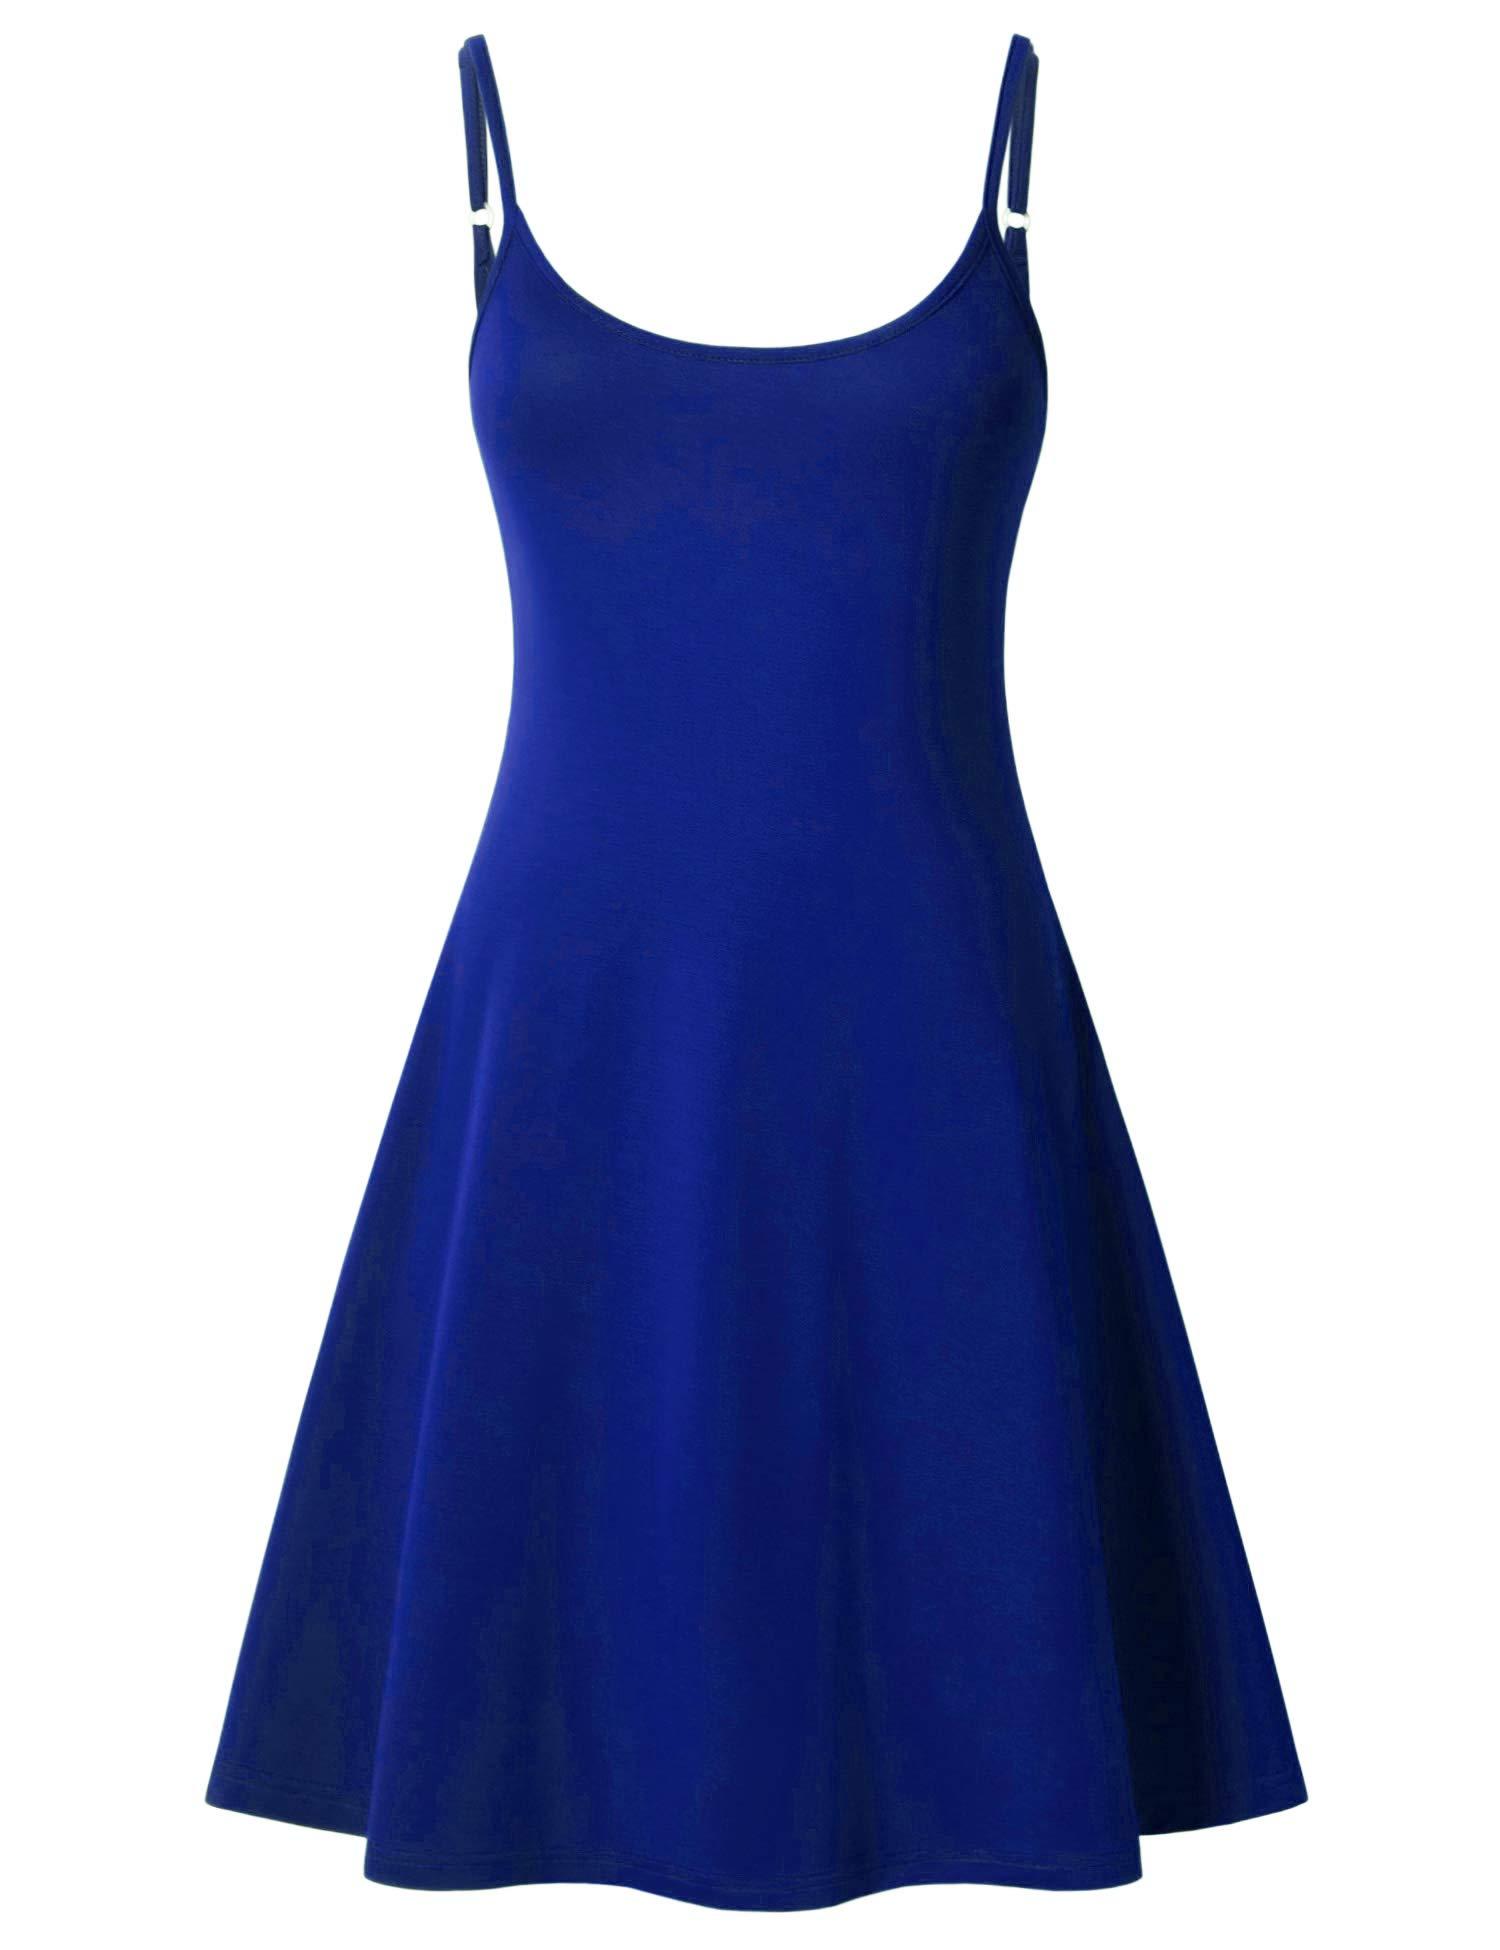 Available at Amazon: Perfashion Women's Sleeveless Adjustable Spaghetti Strap Slip Sleep Basic Dress